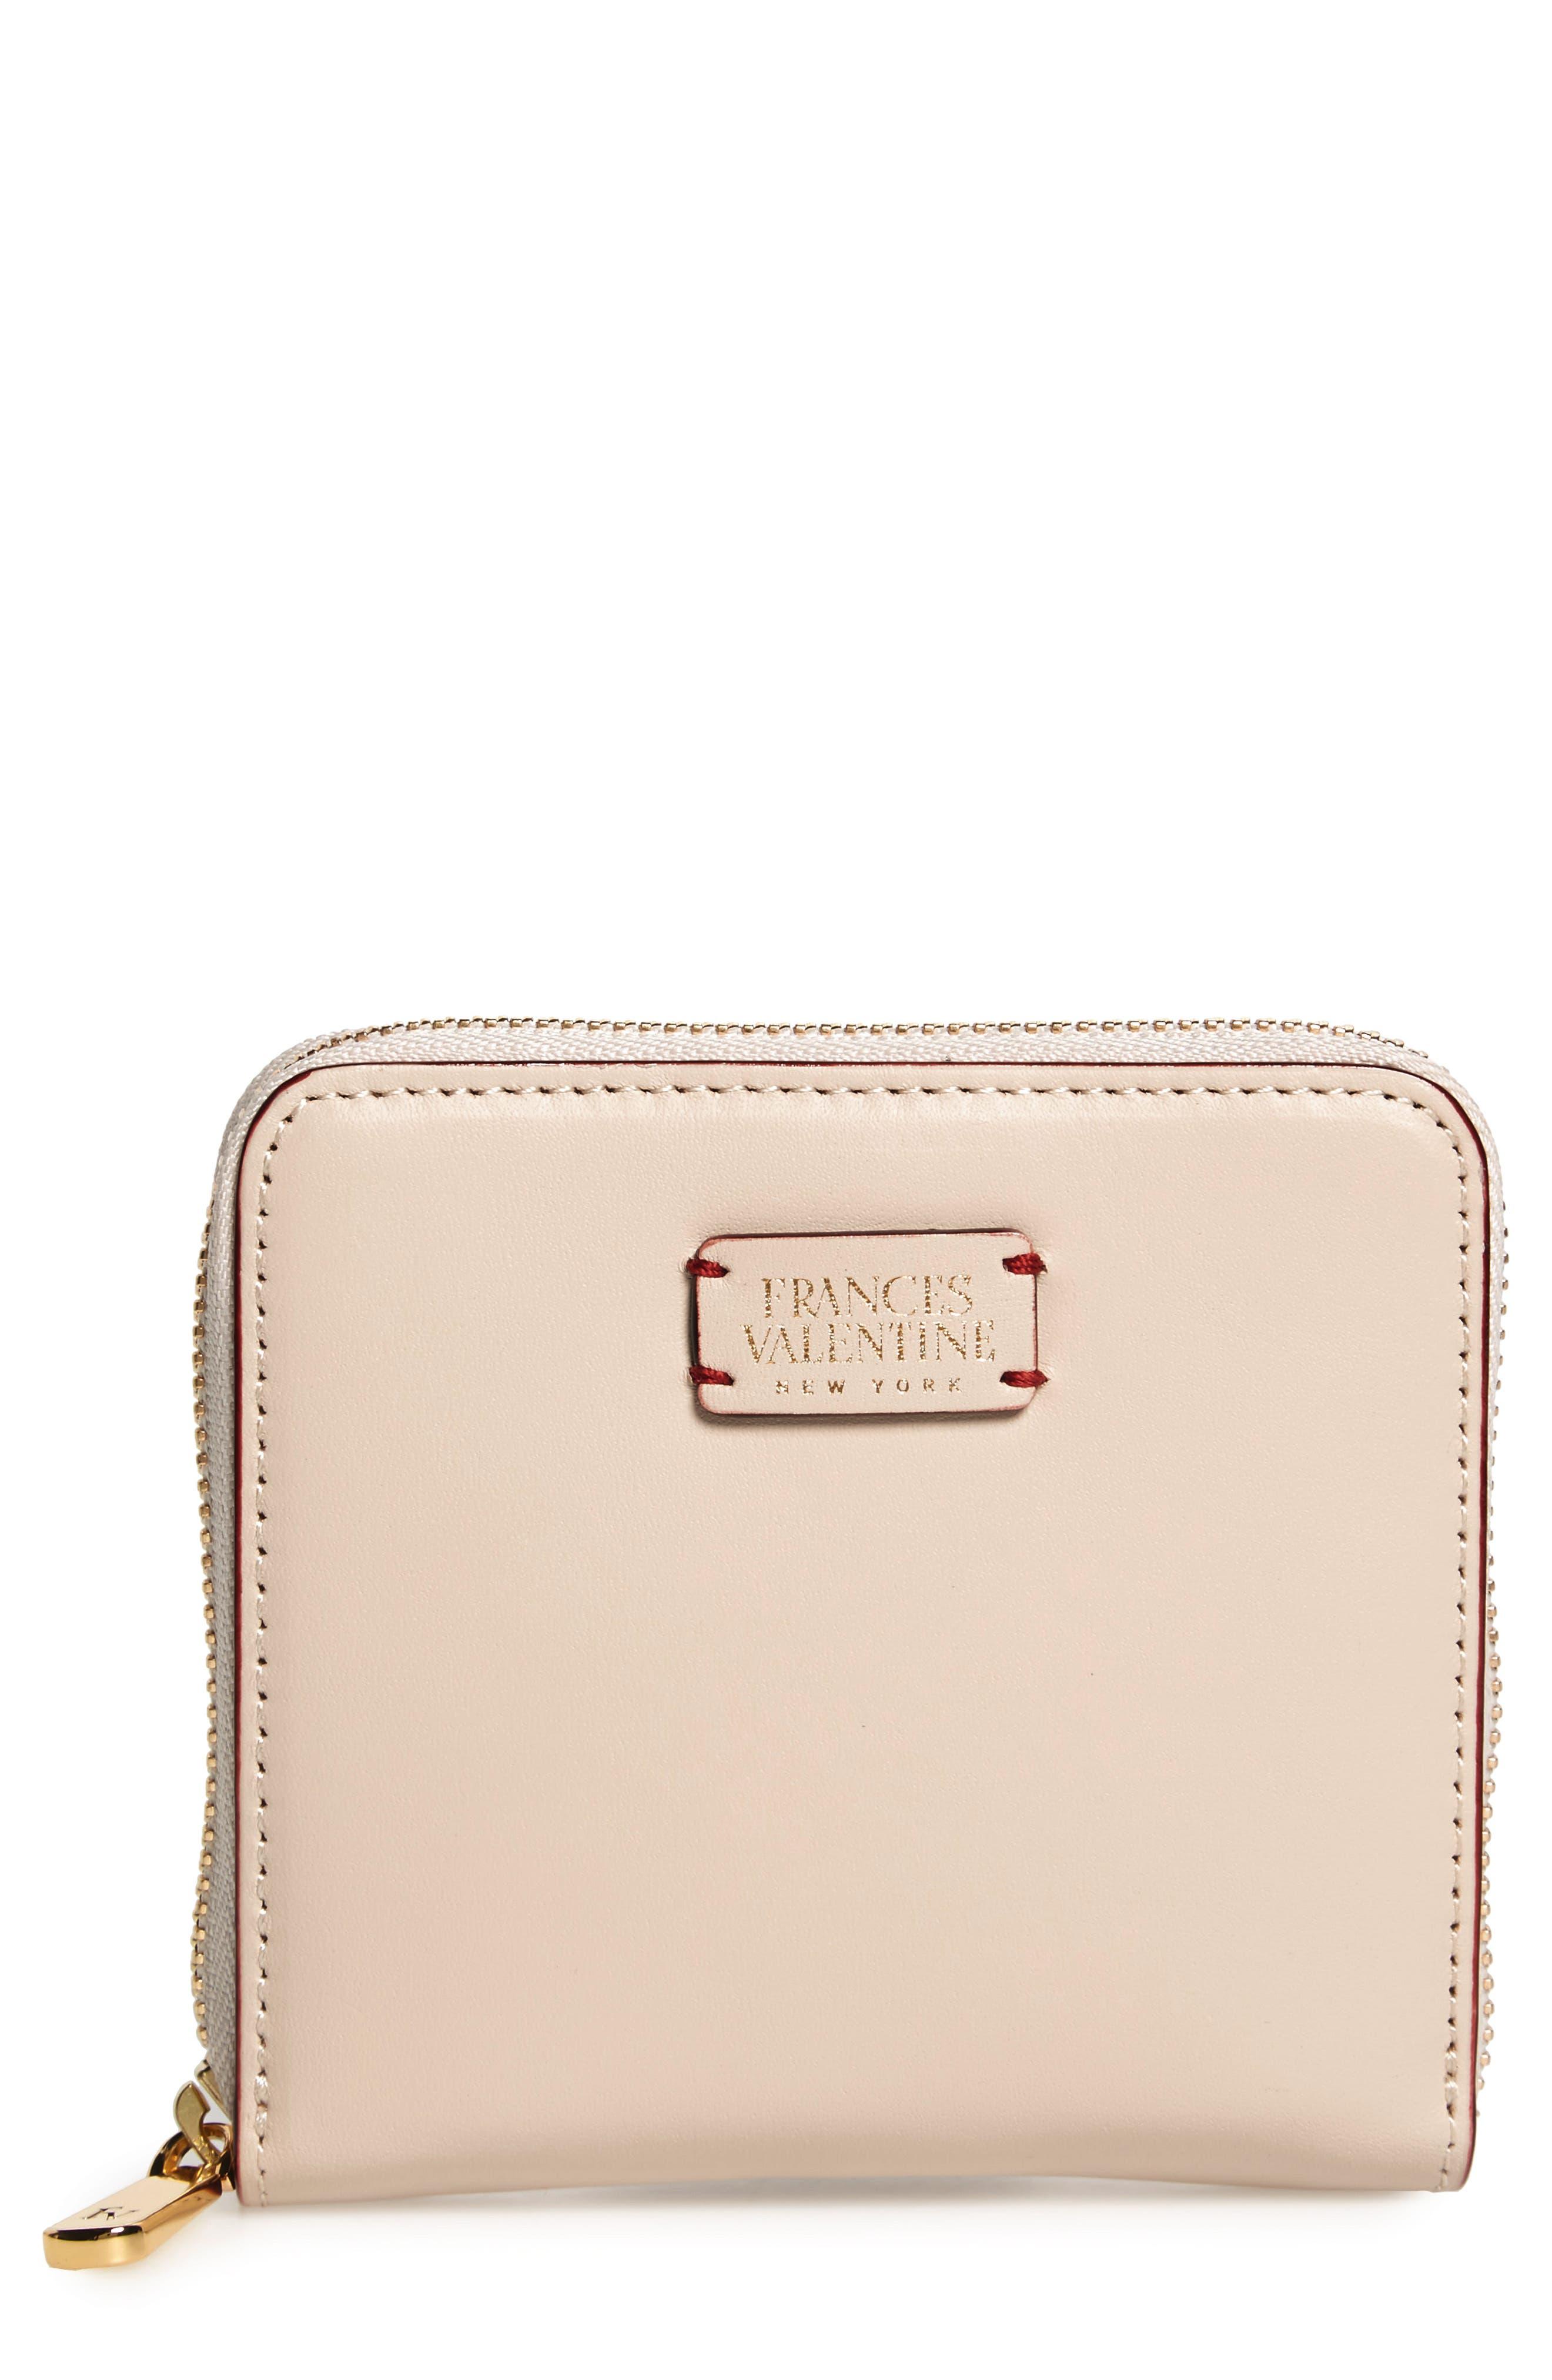 Frances Valentine Small Roosevelt Calfskin Leather Wallet